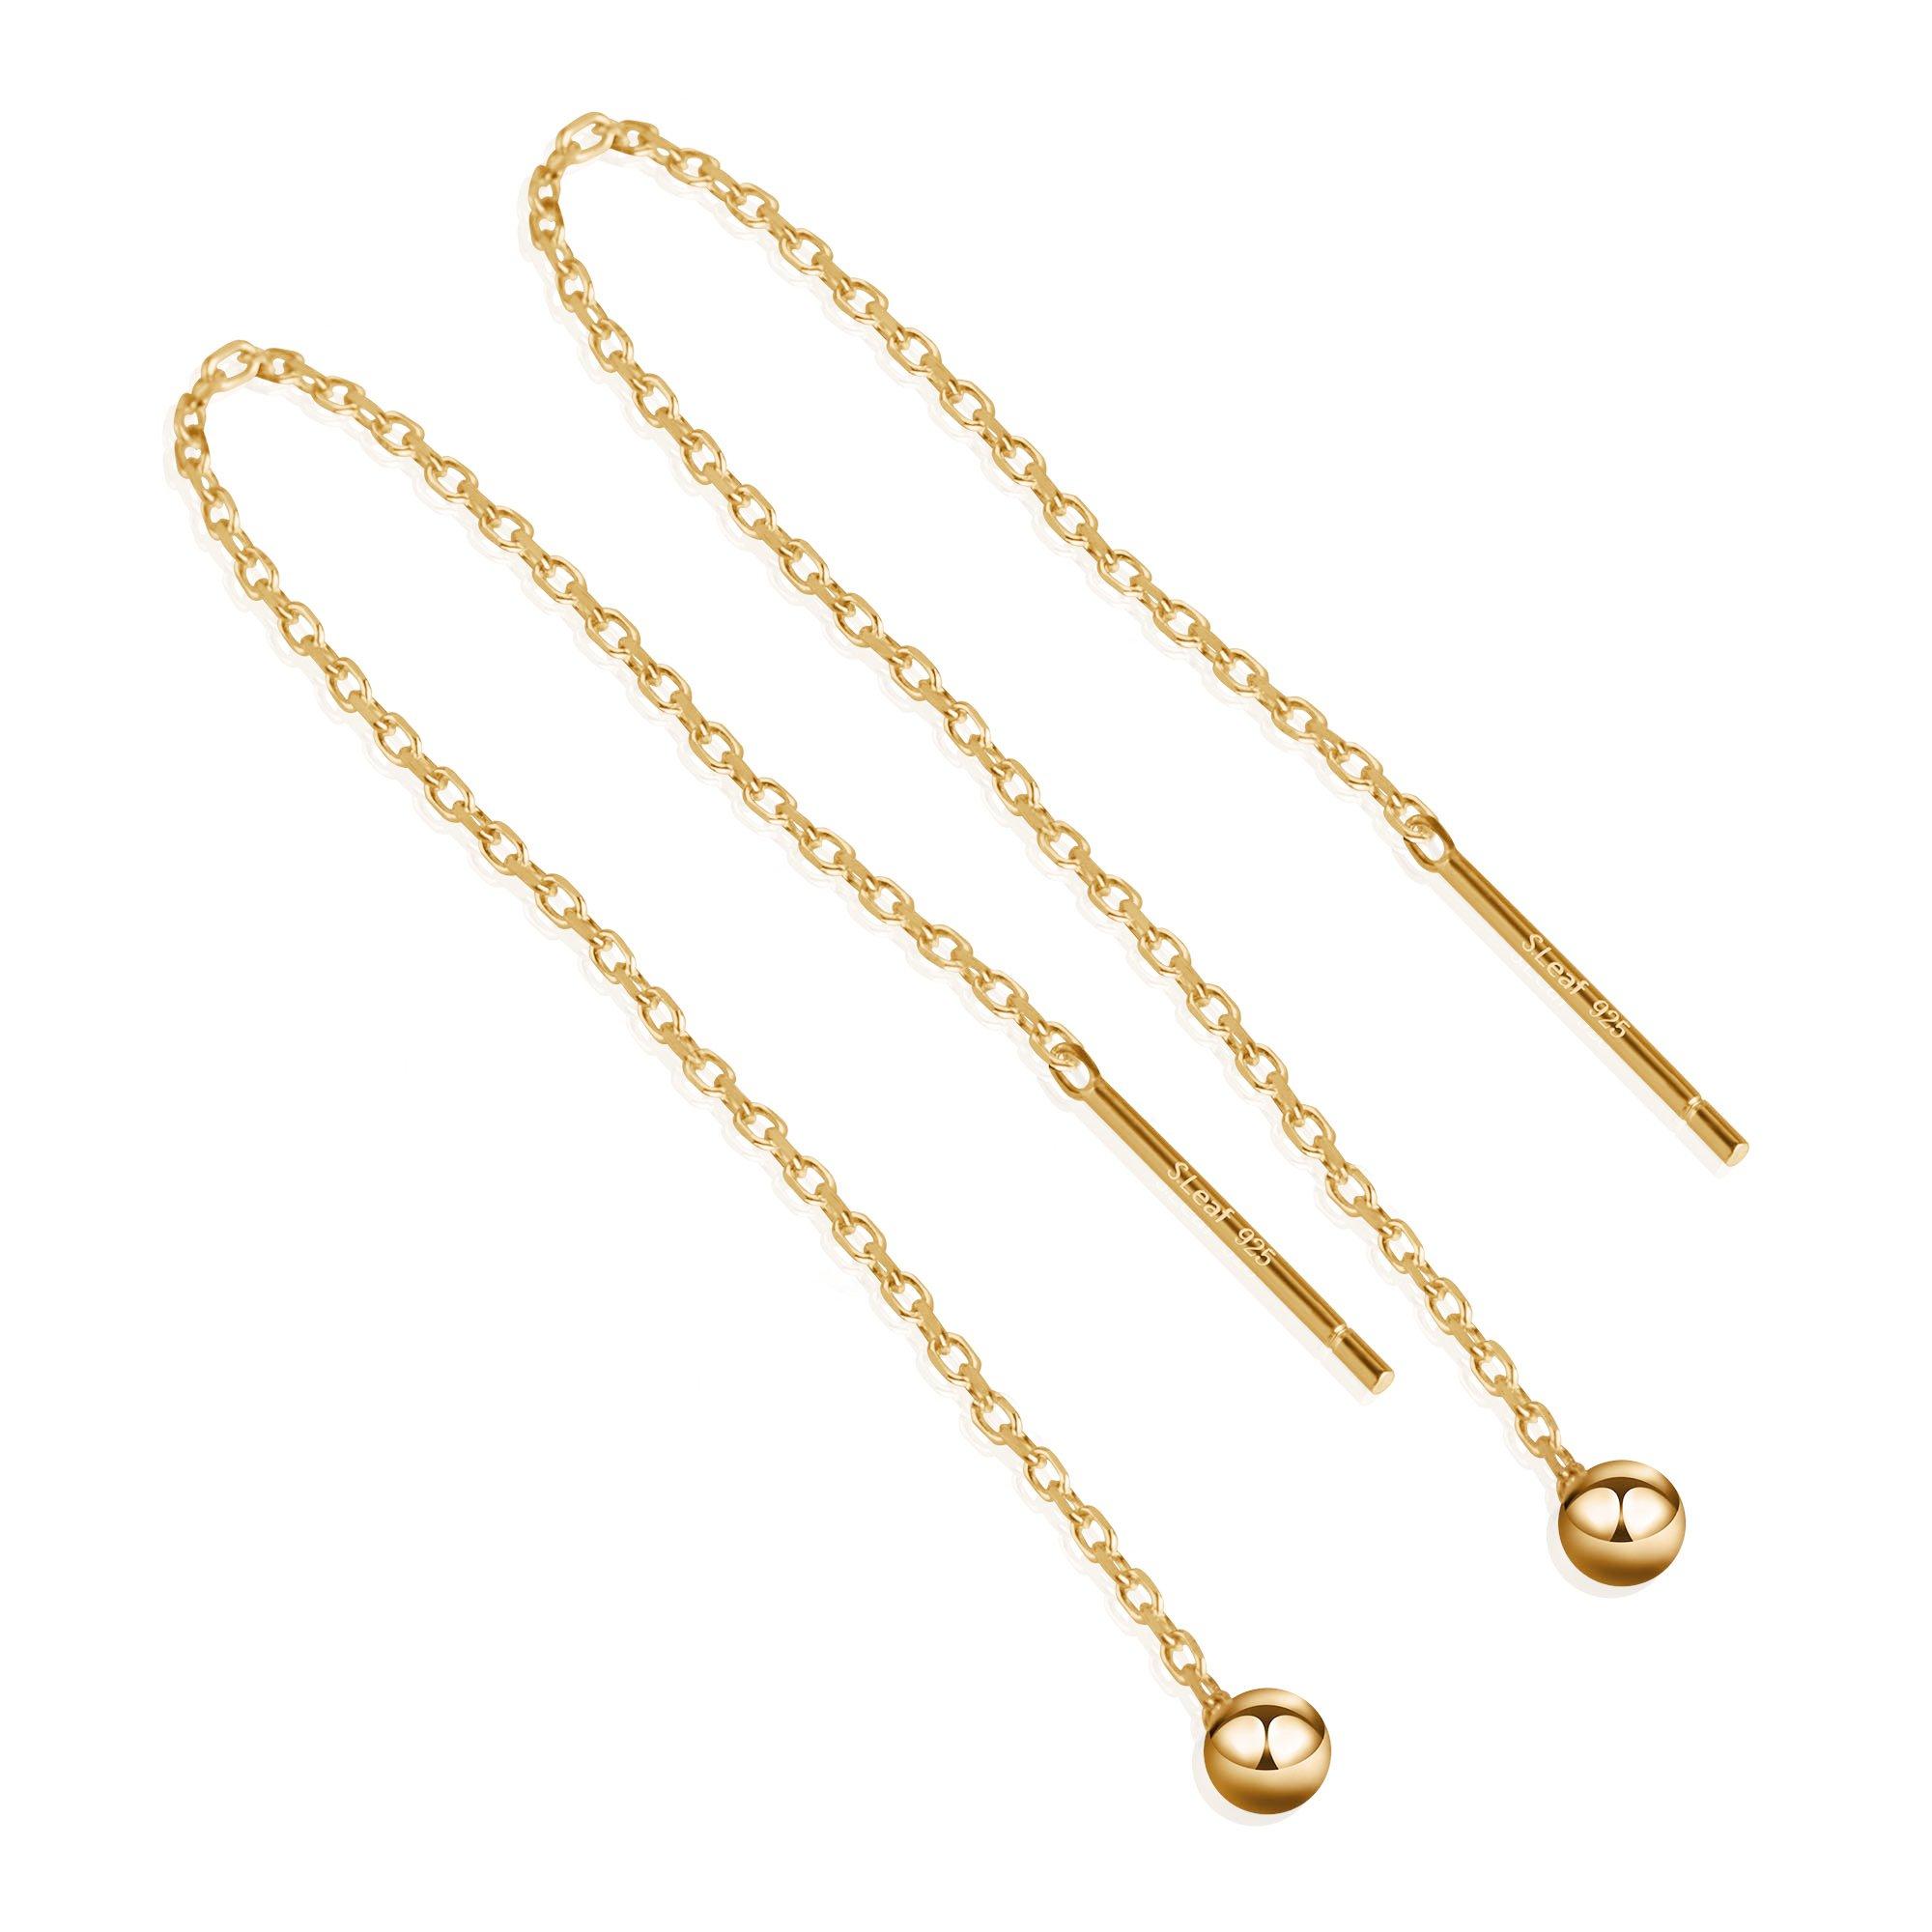 S.Leaf Minimalism Threader Tassel Earrings Sterling Silver Tiny Ball Drop Long Chain Earrings (9 CM/Gold)